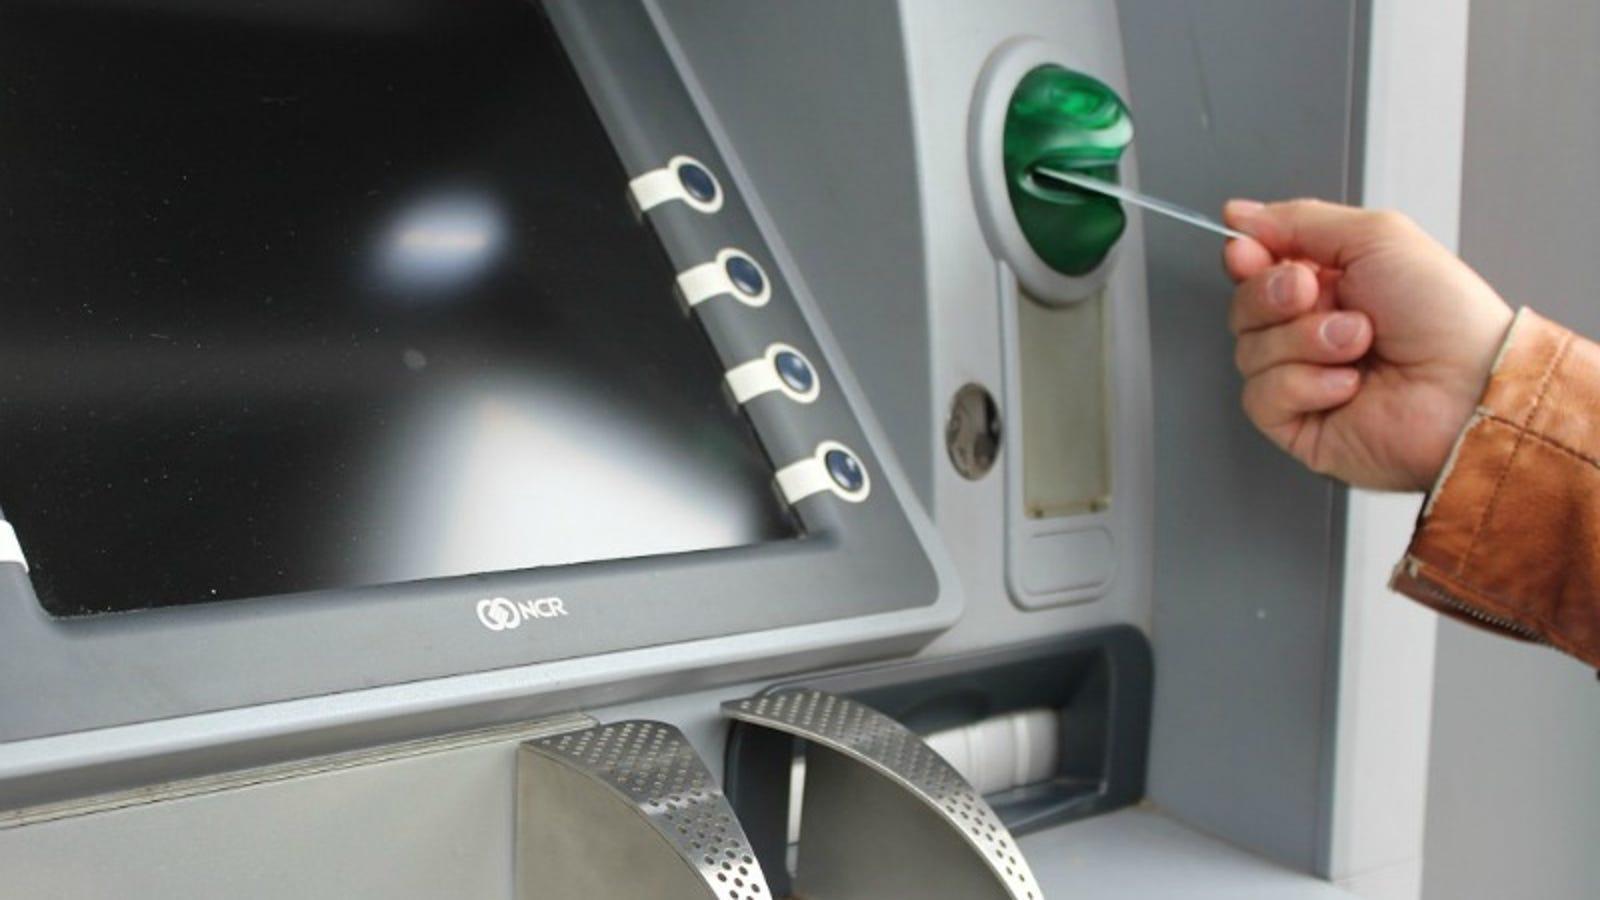 What Happens When Your Bank Loses a Cash Deposit